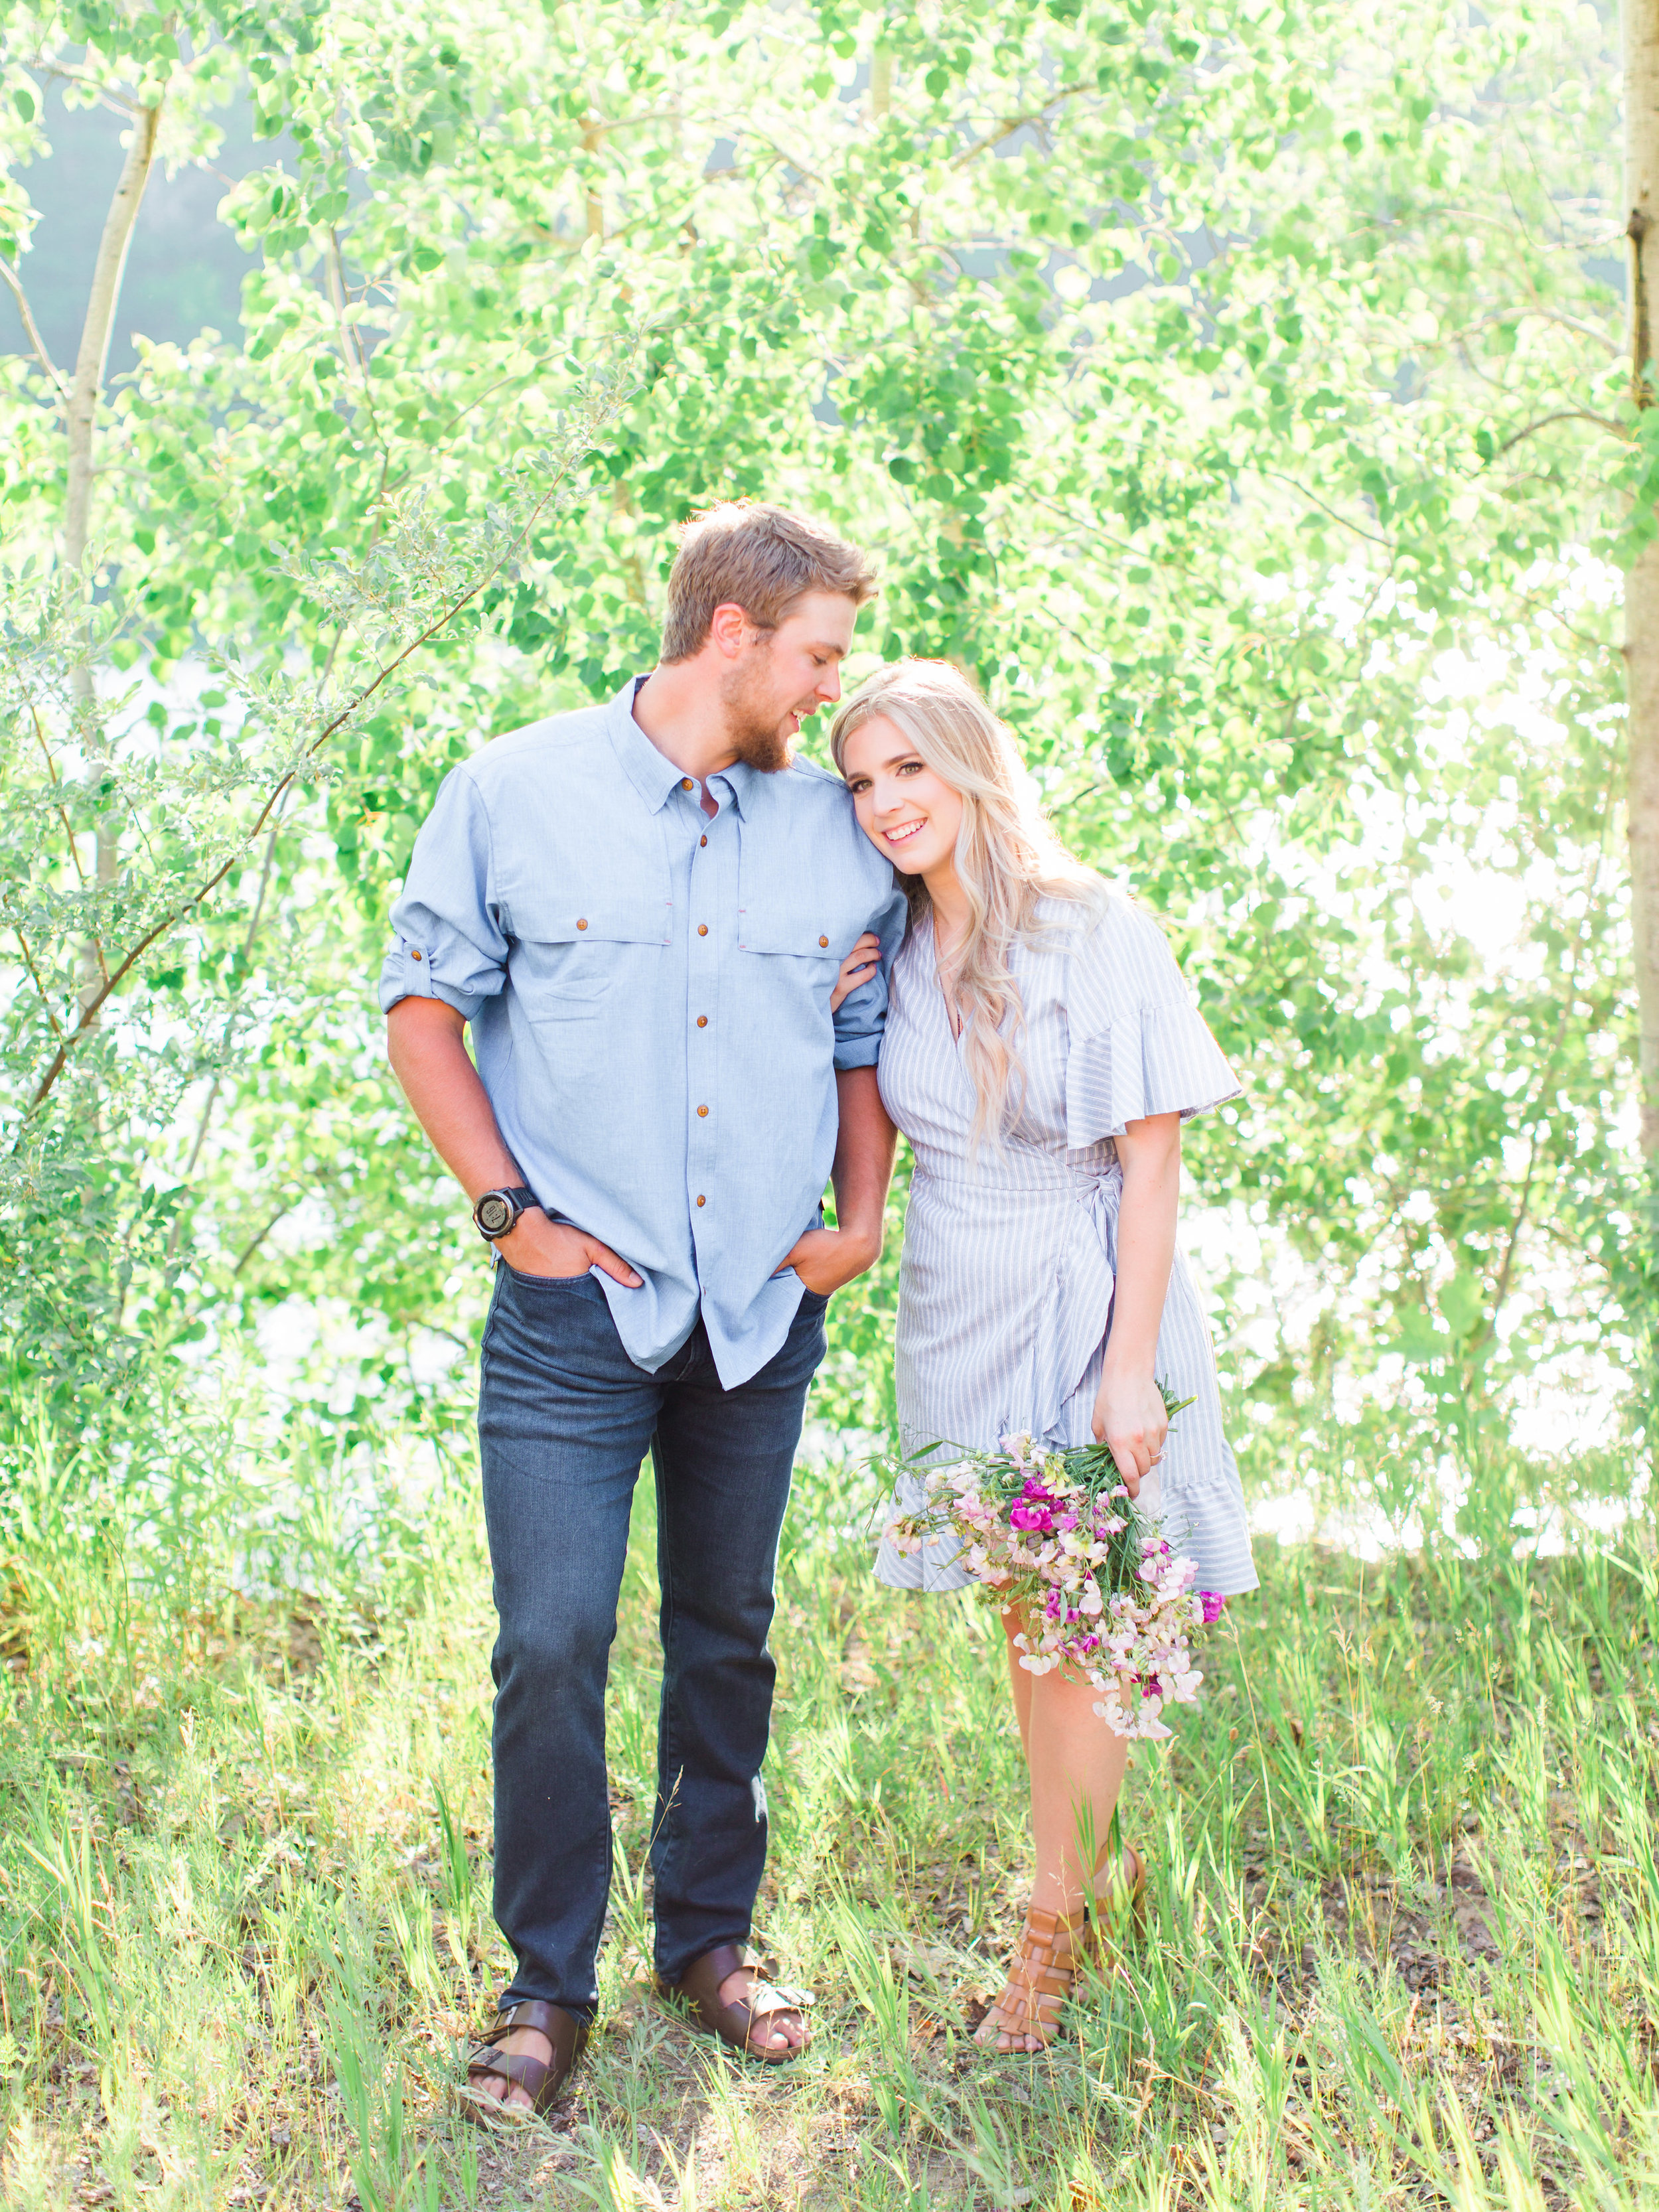 Hannah+Kyle+Engaged-20.jpg